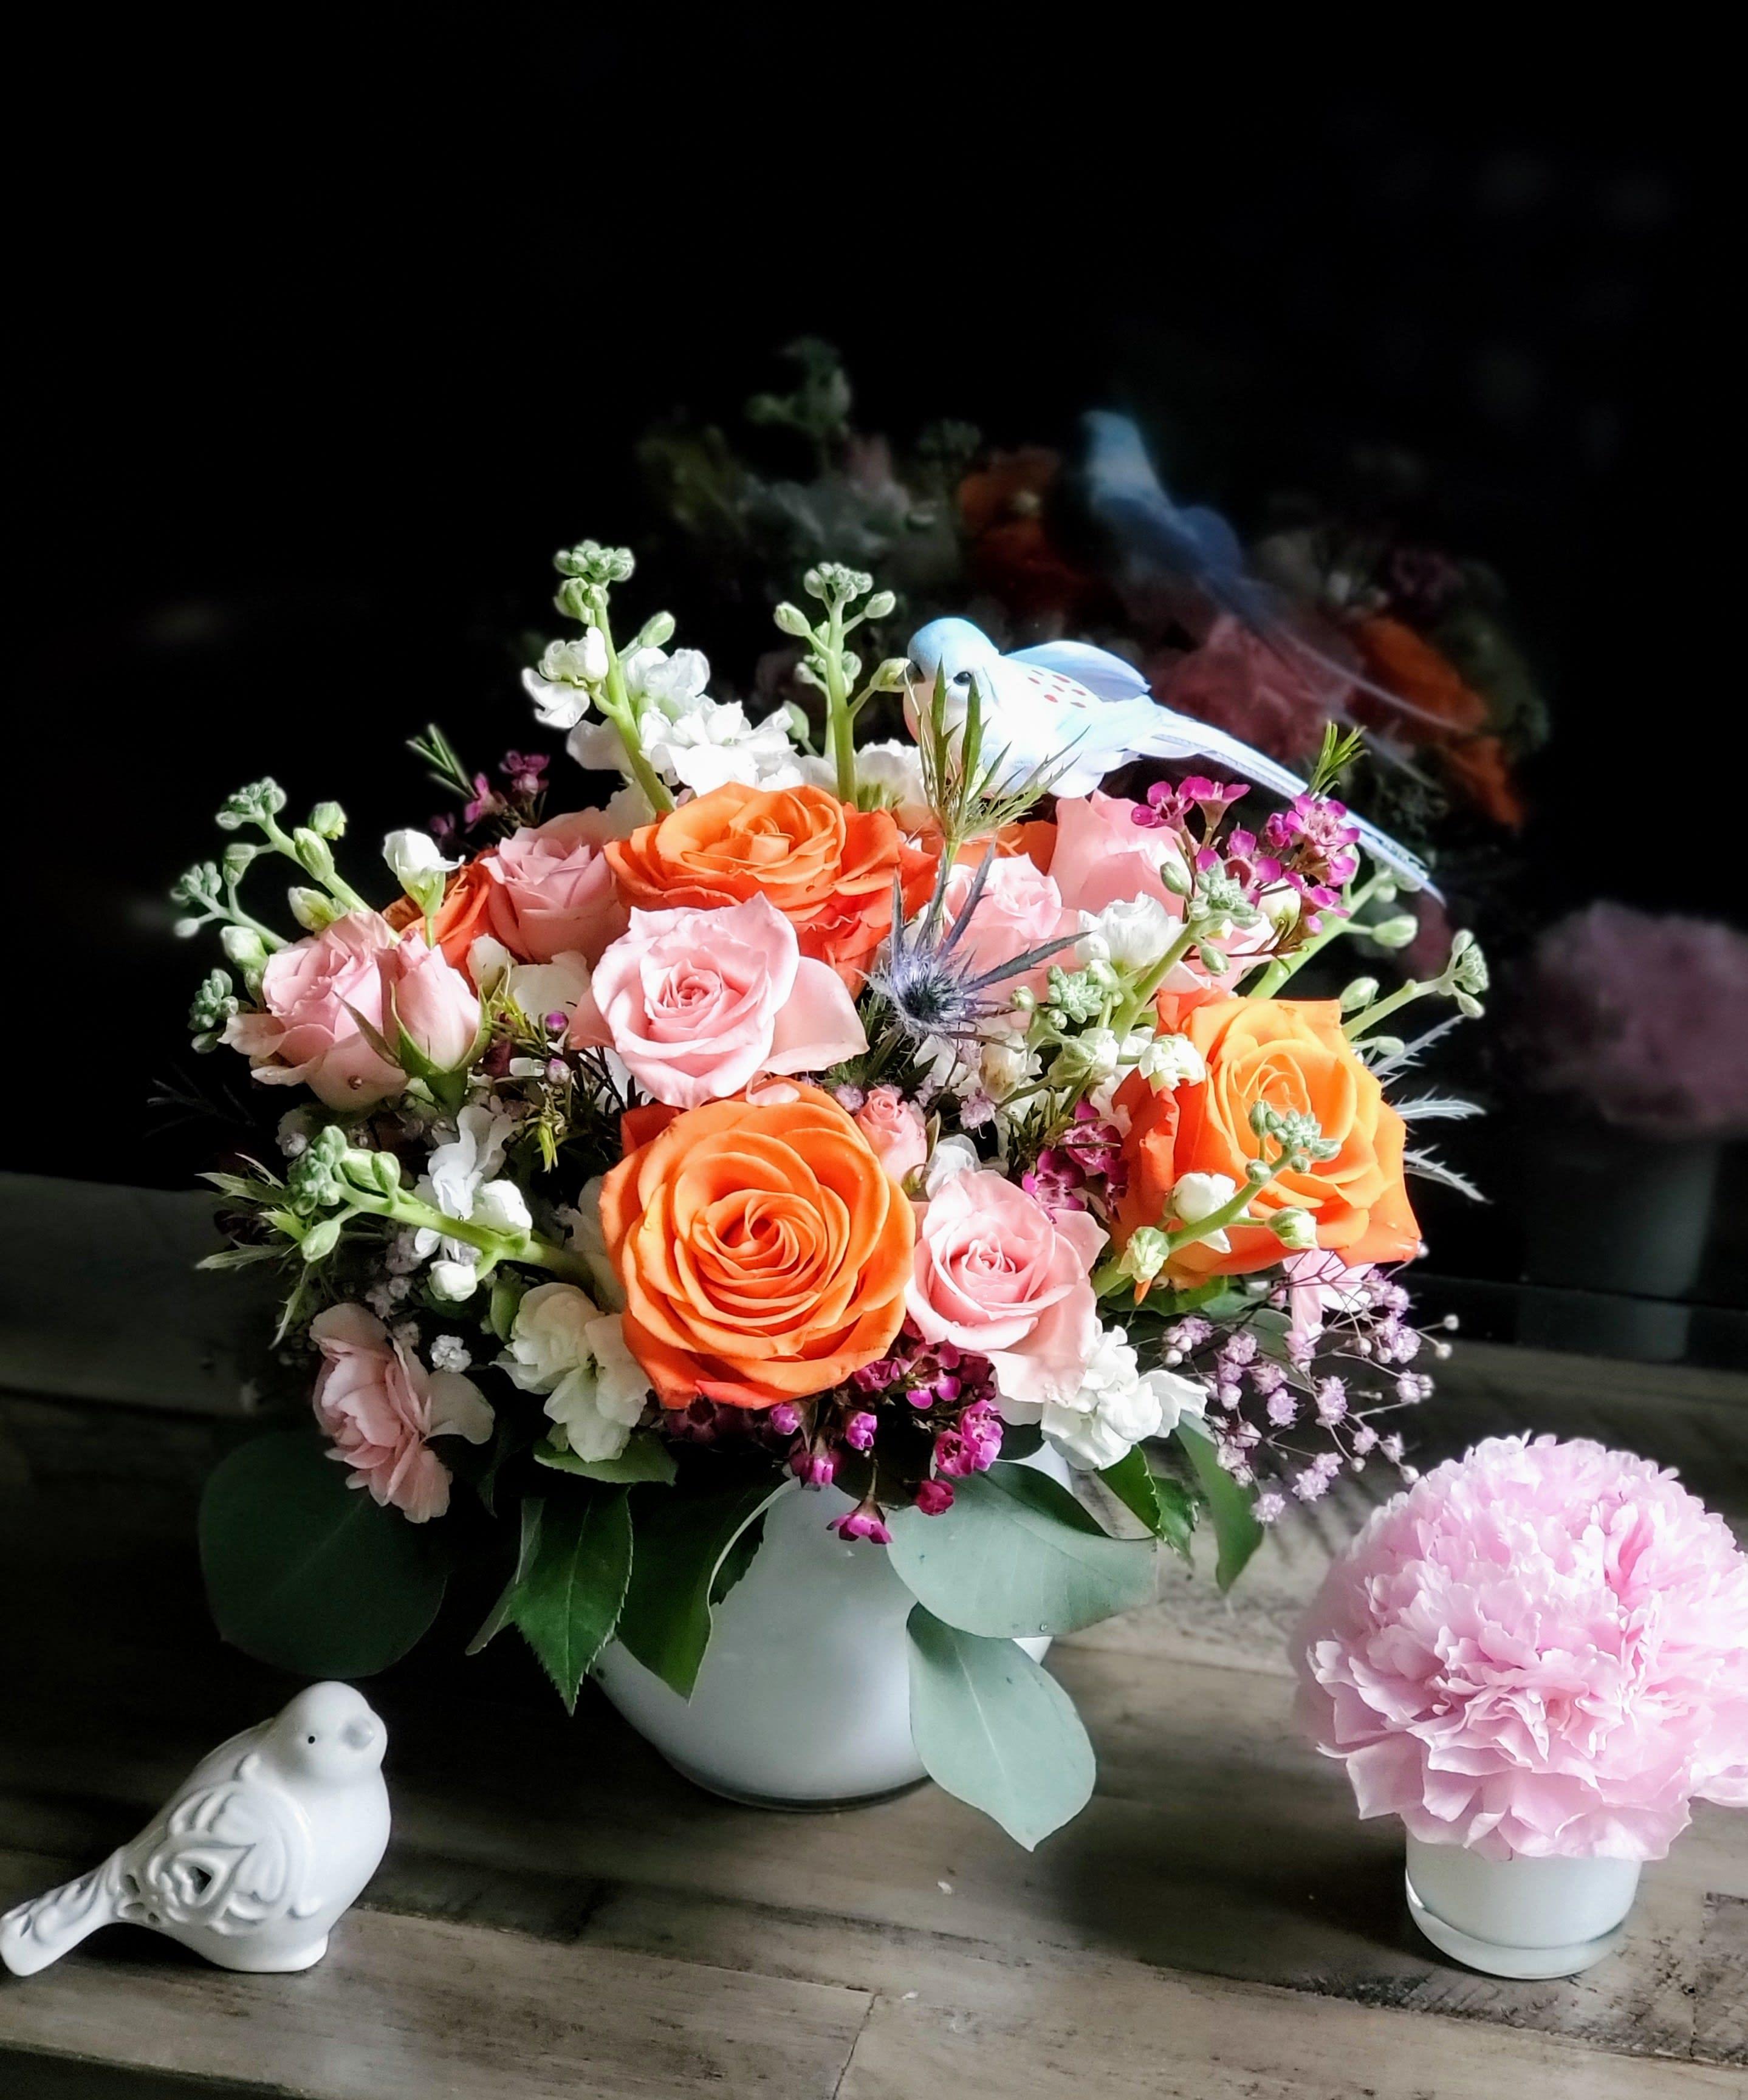 Mom S Rose Garden Bouquet In Germantown Md Jireh S Flowers